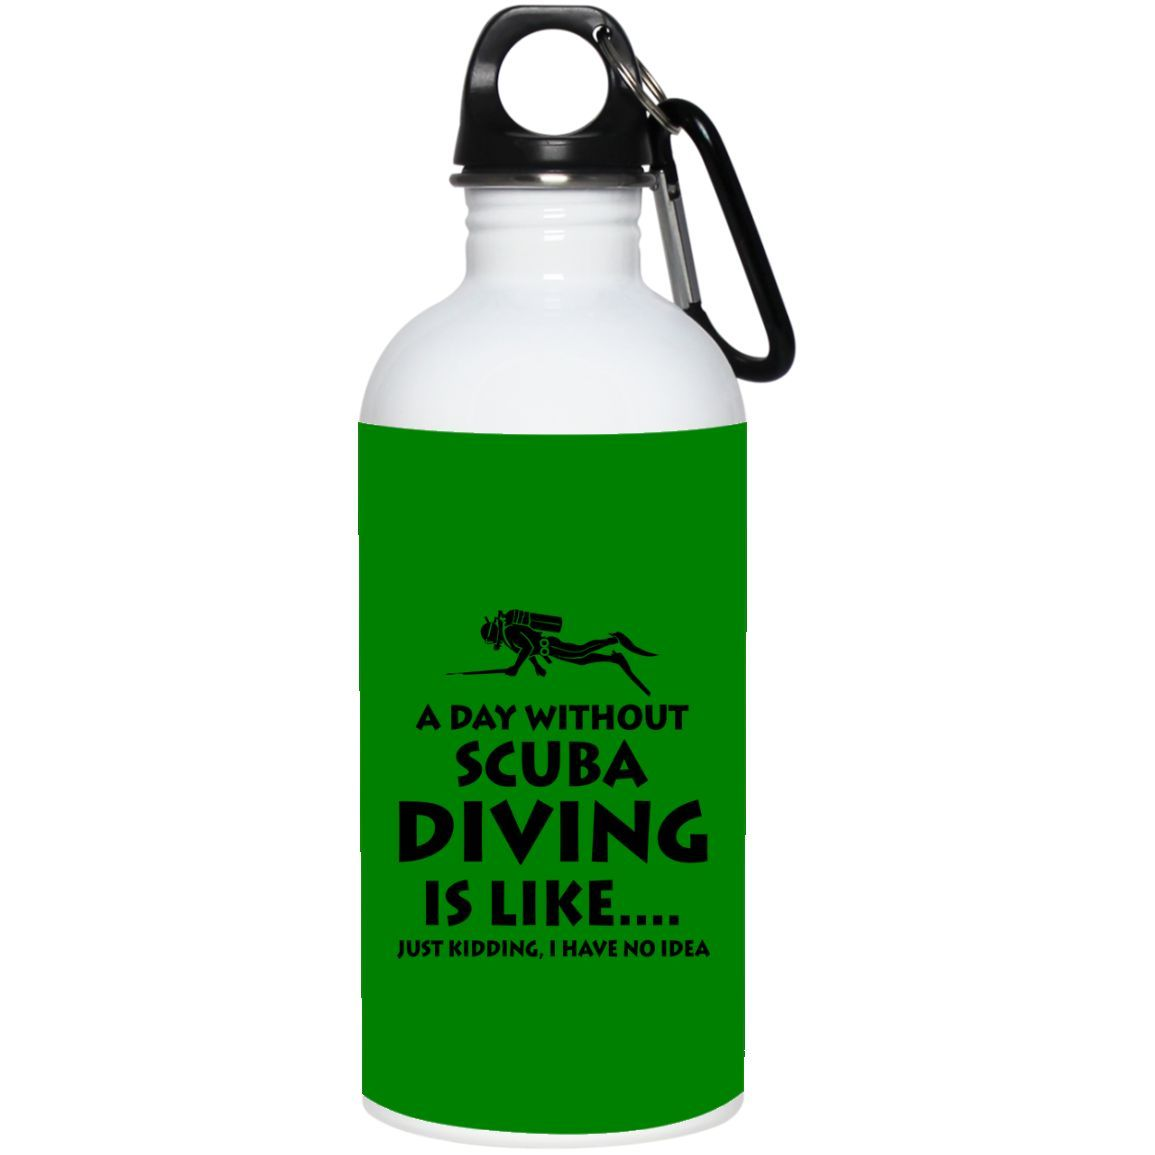 20 oz Stainless Steel Water Bottle